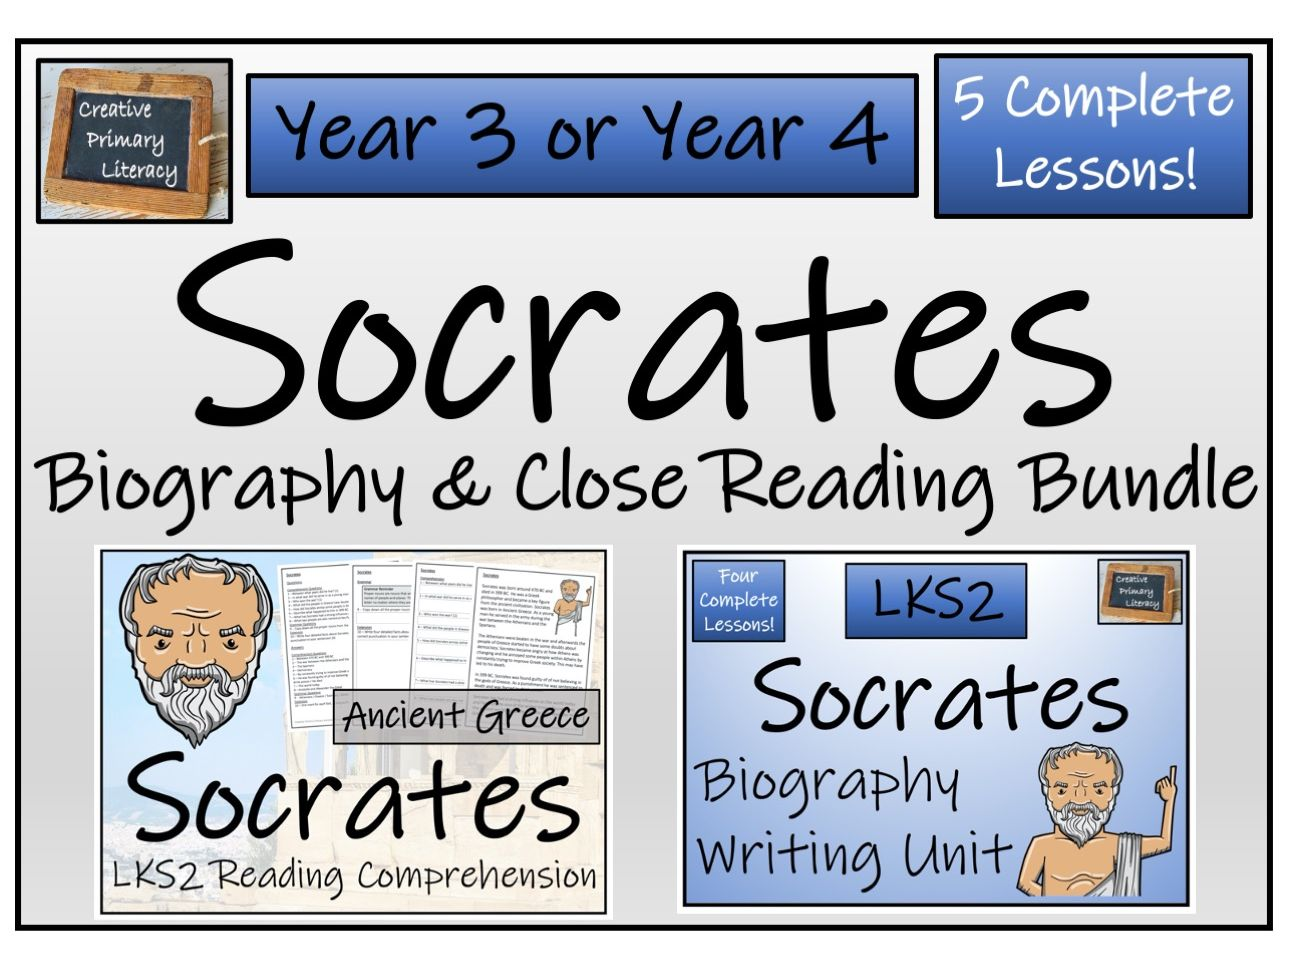 LKS2 History Socrates Reading Comprehension & Biography Bundle